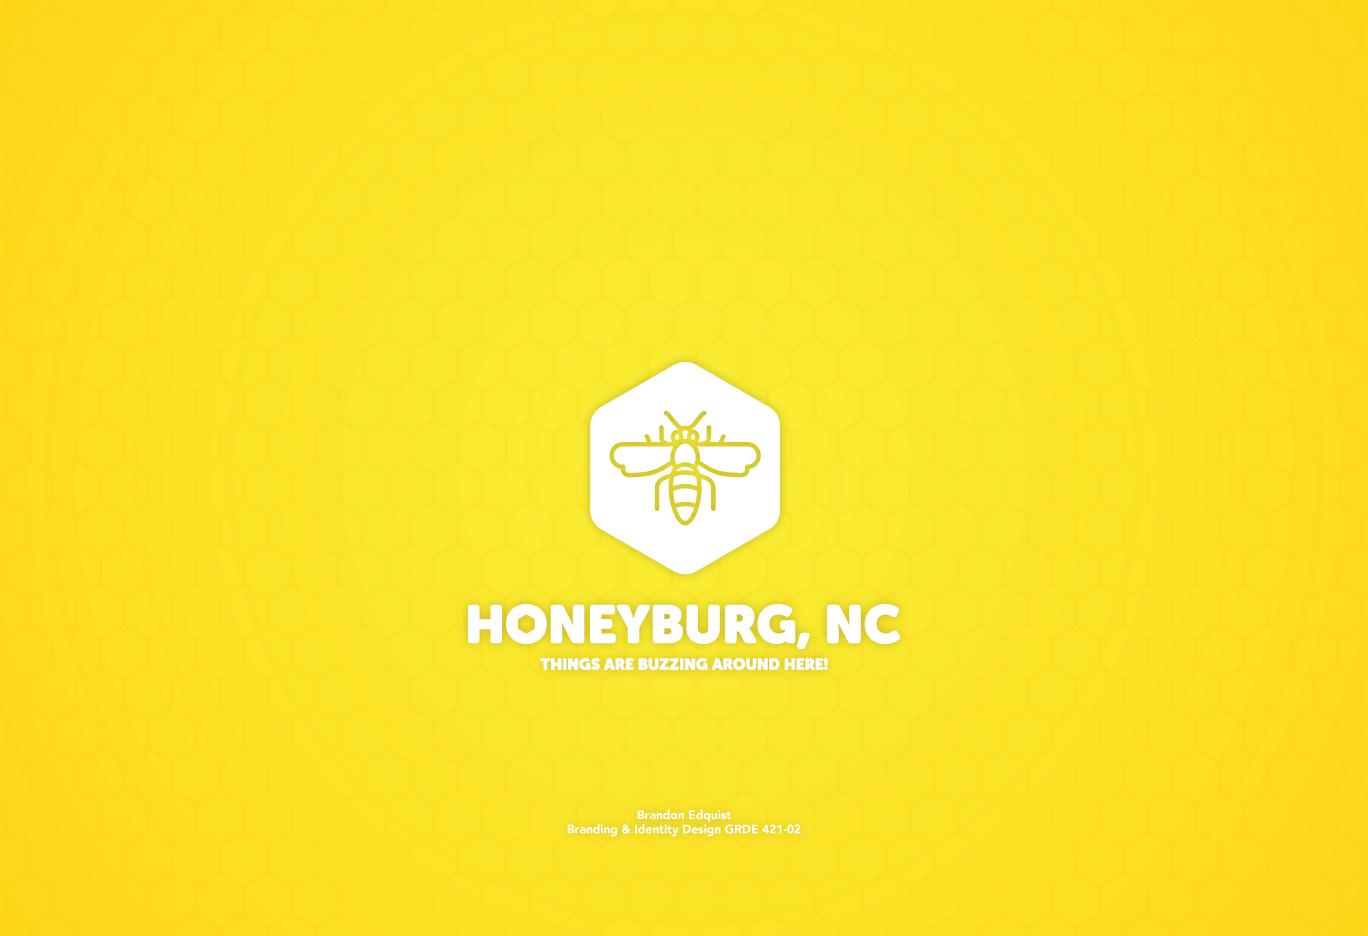 Edquist_Brandon_Honeyburg1.png